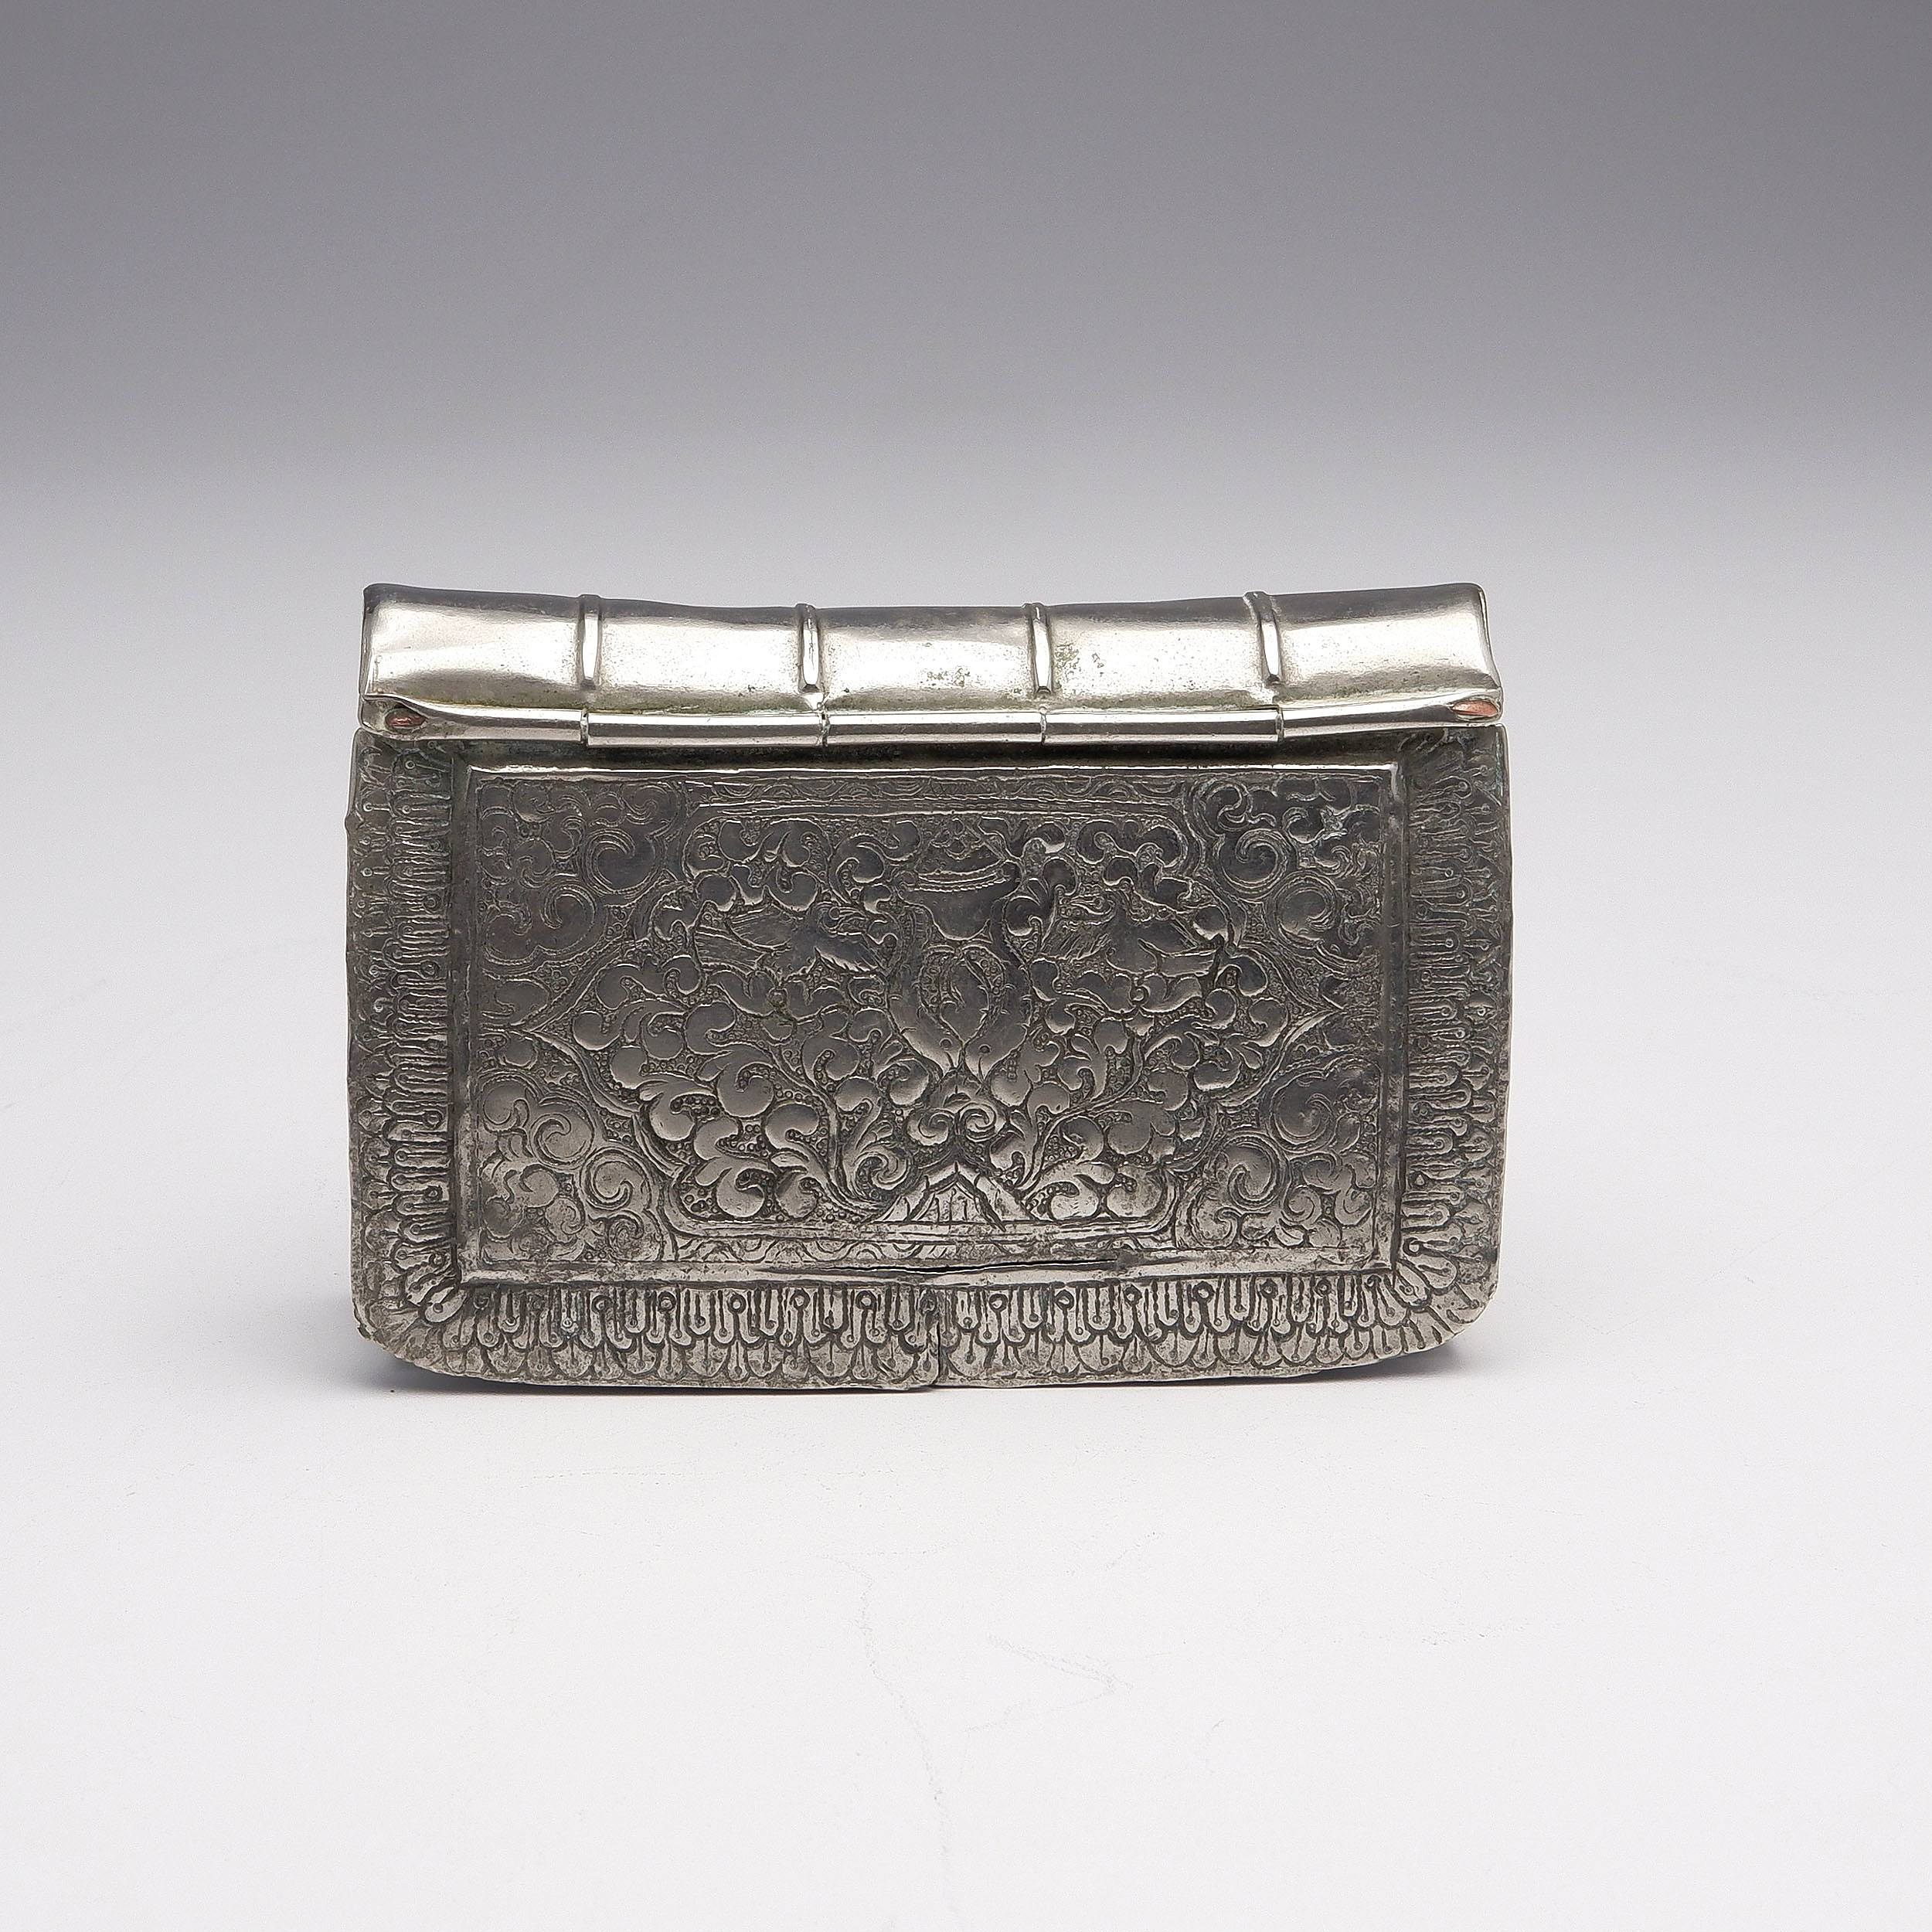 'Burmese Engraved Silver Book Form Box, 113g'